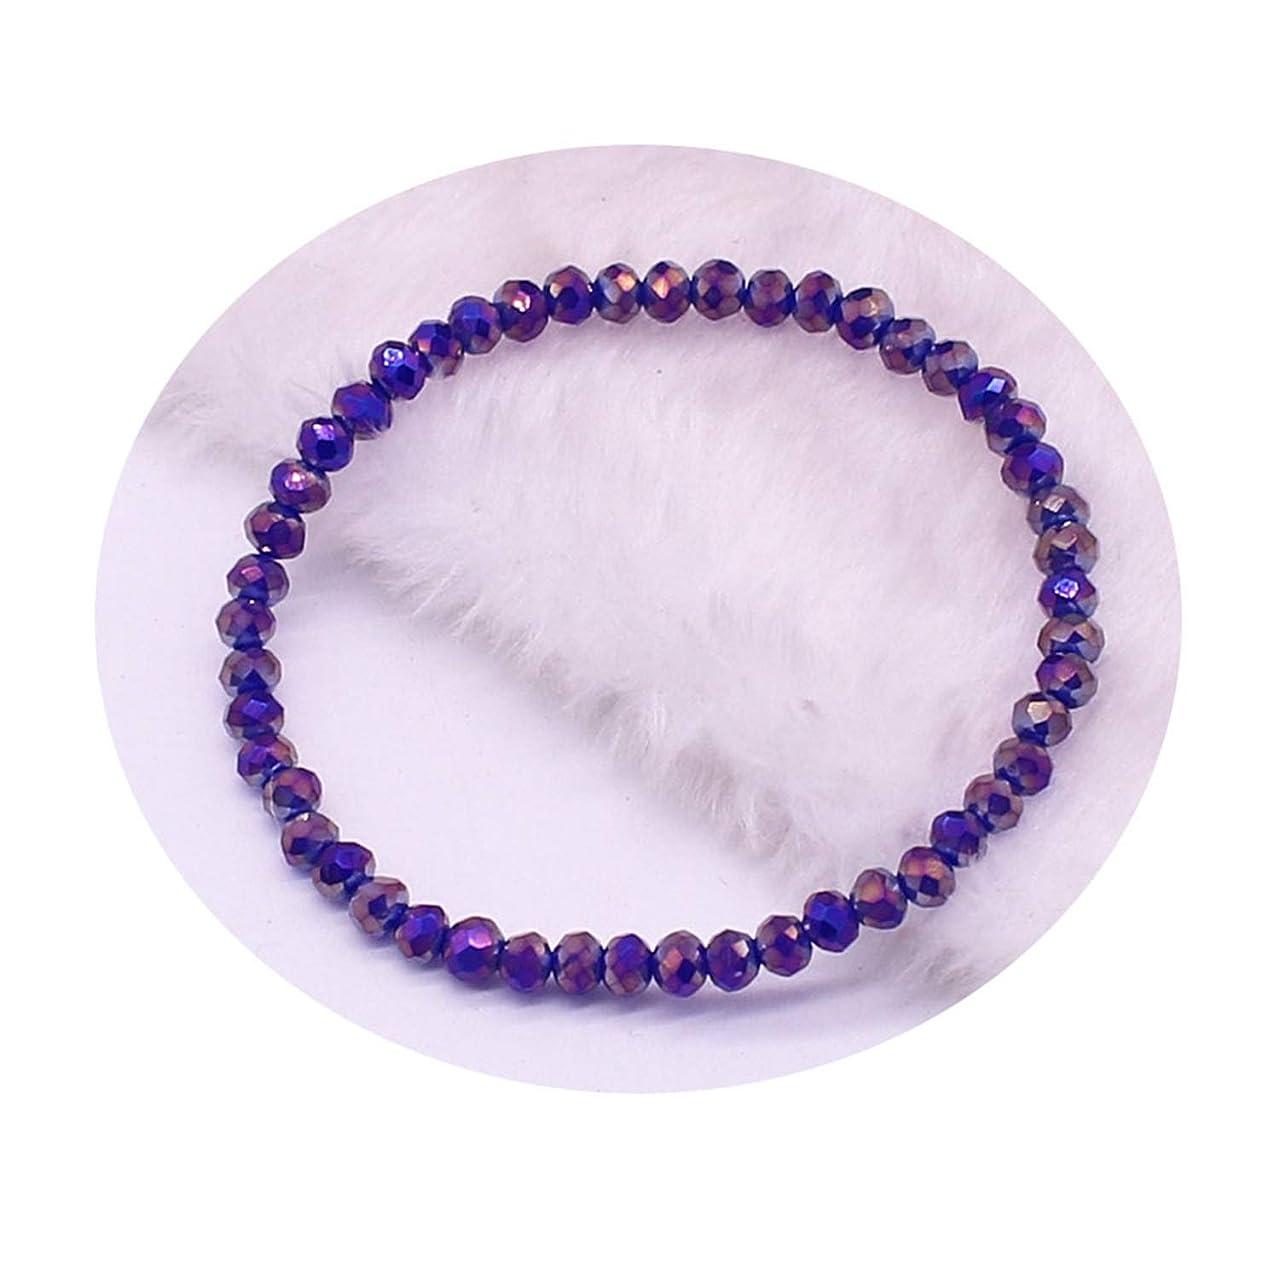 Crystal Bracelet 14 Colors Optional Beaded Bracelets for Women Crystal Beads Bracelet Jewelry